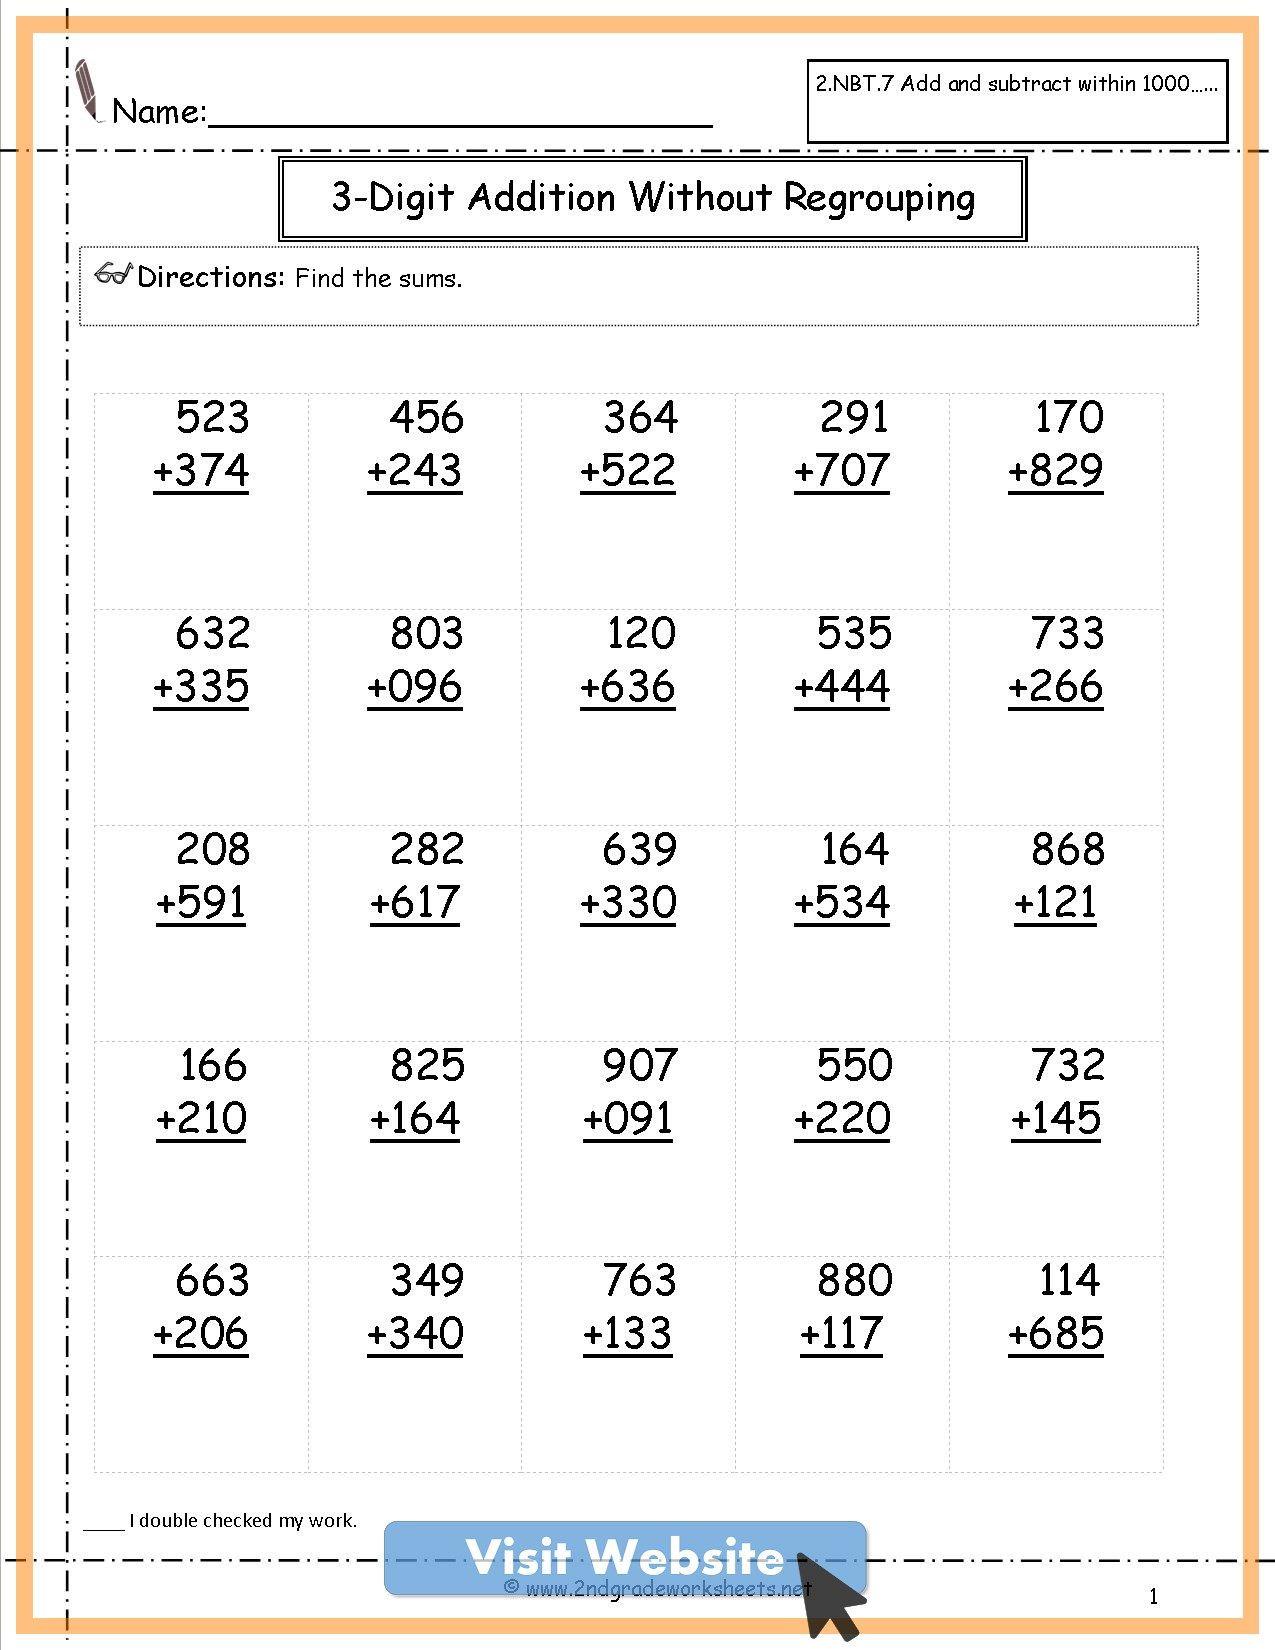 Subtraction First Grade Activities Math Worksheets Math Addition Worksheets 2nd Grade Math Worksheets 2nd Grade Worksheets